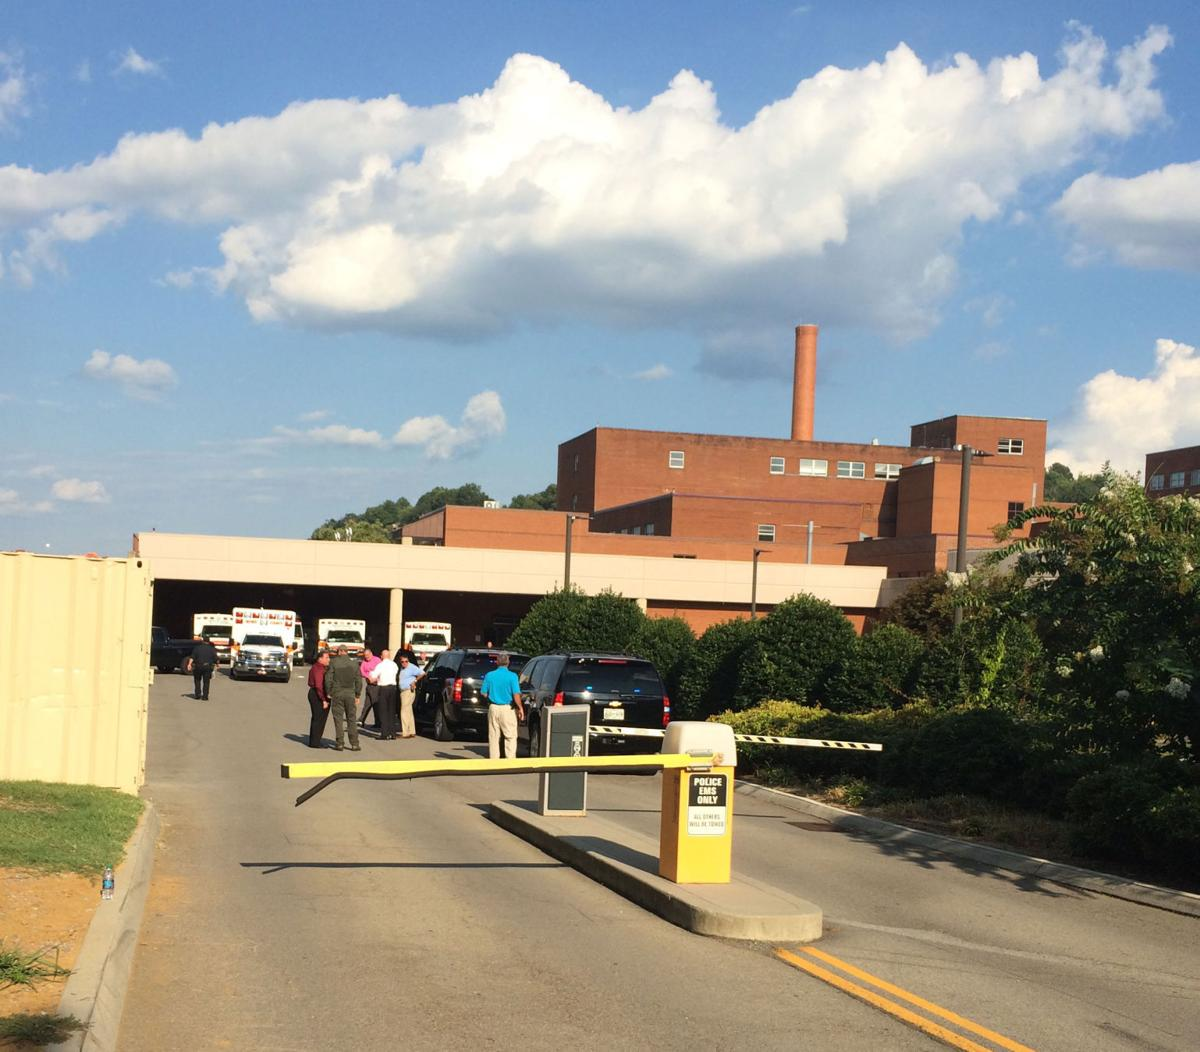 University Of Tennessee Hospital Emergency Room